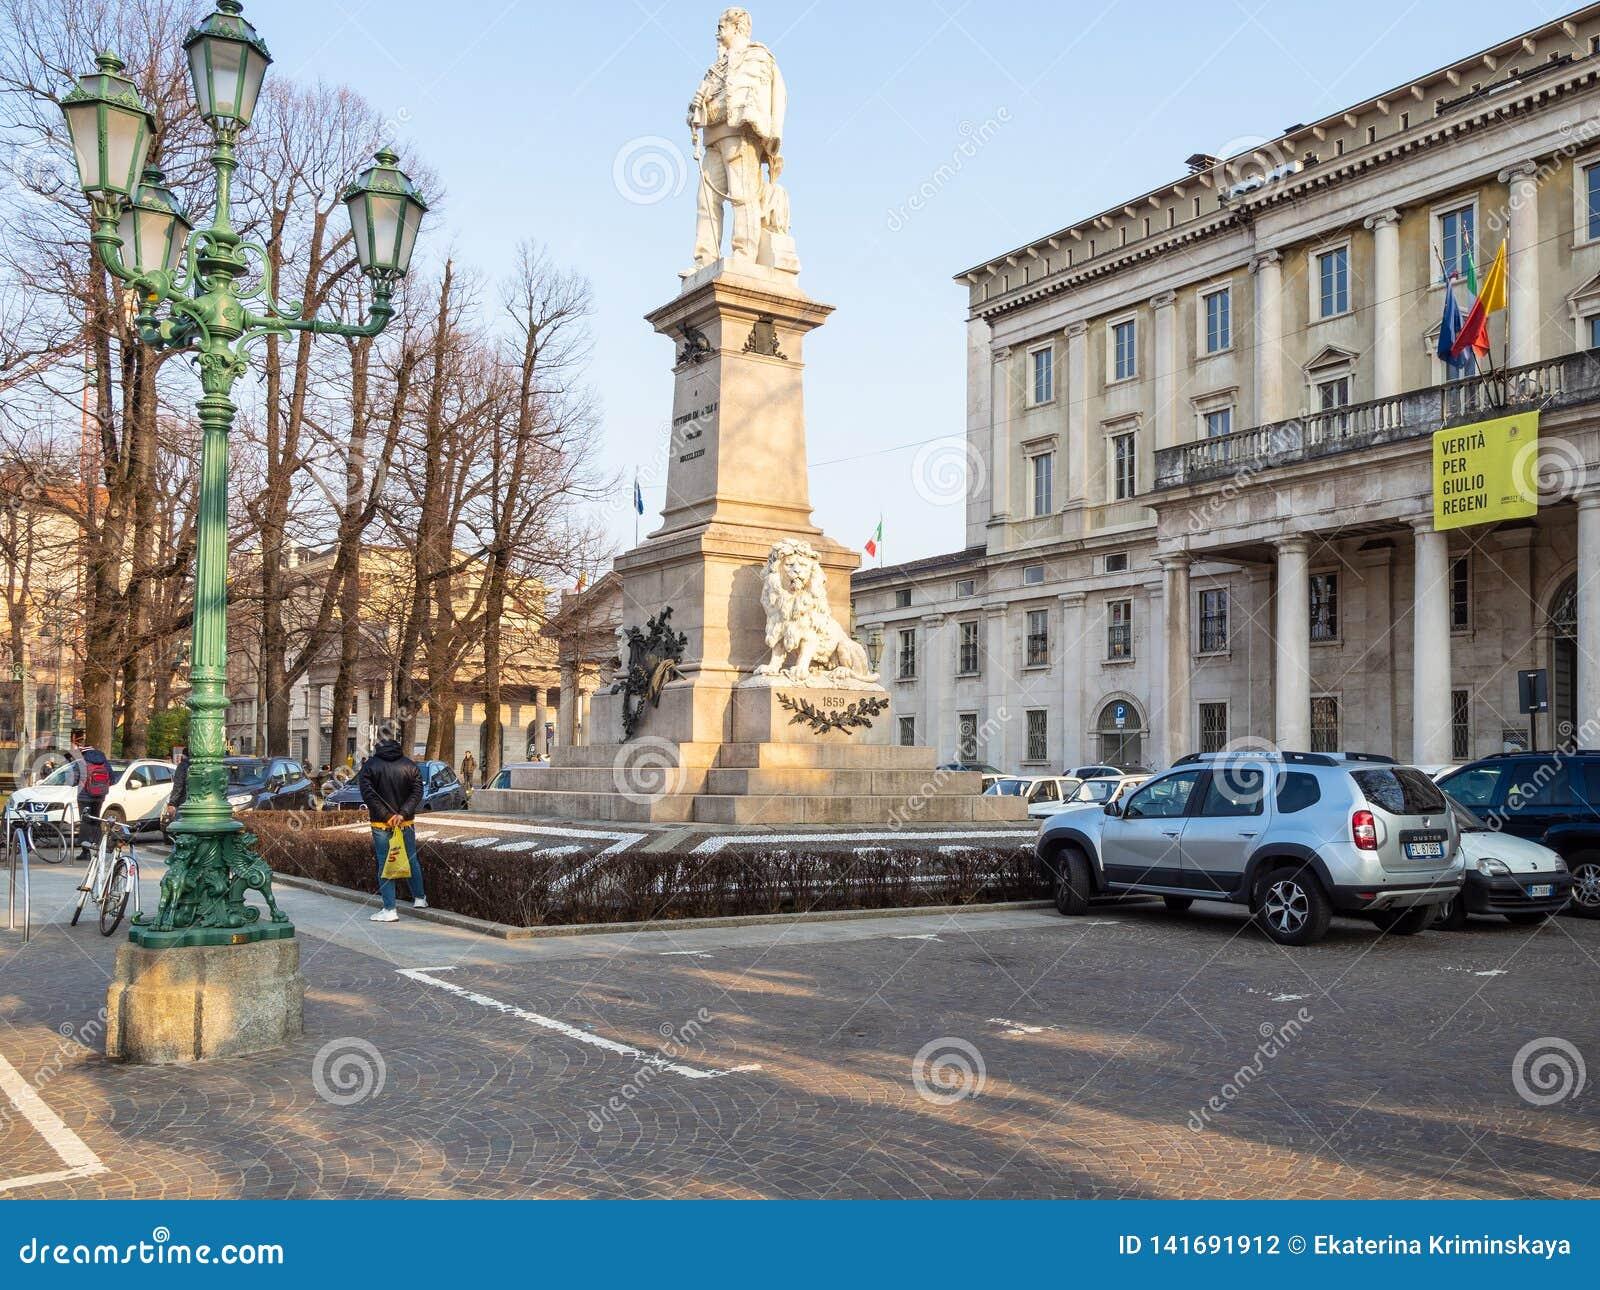 Quadratischer Marktplatz Giacomo Matteotti In Bergamo-Stadt Redaktionelles  Stockfotografie - Bild von lombardei, tour: 141691912